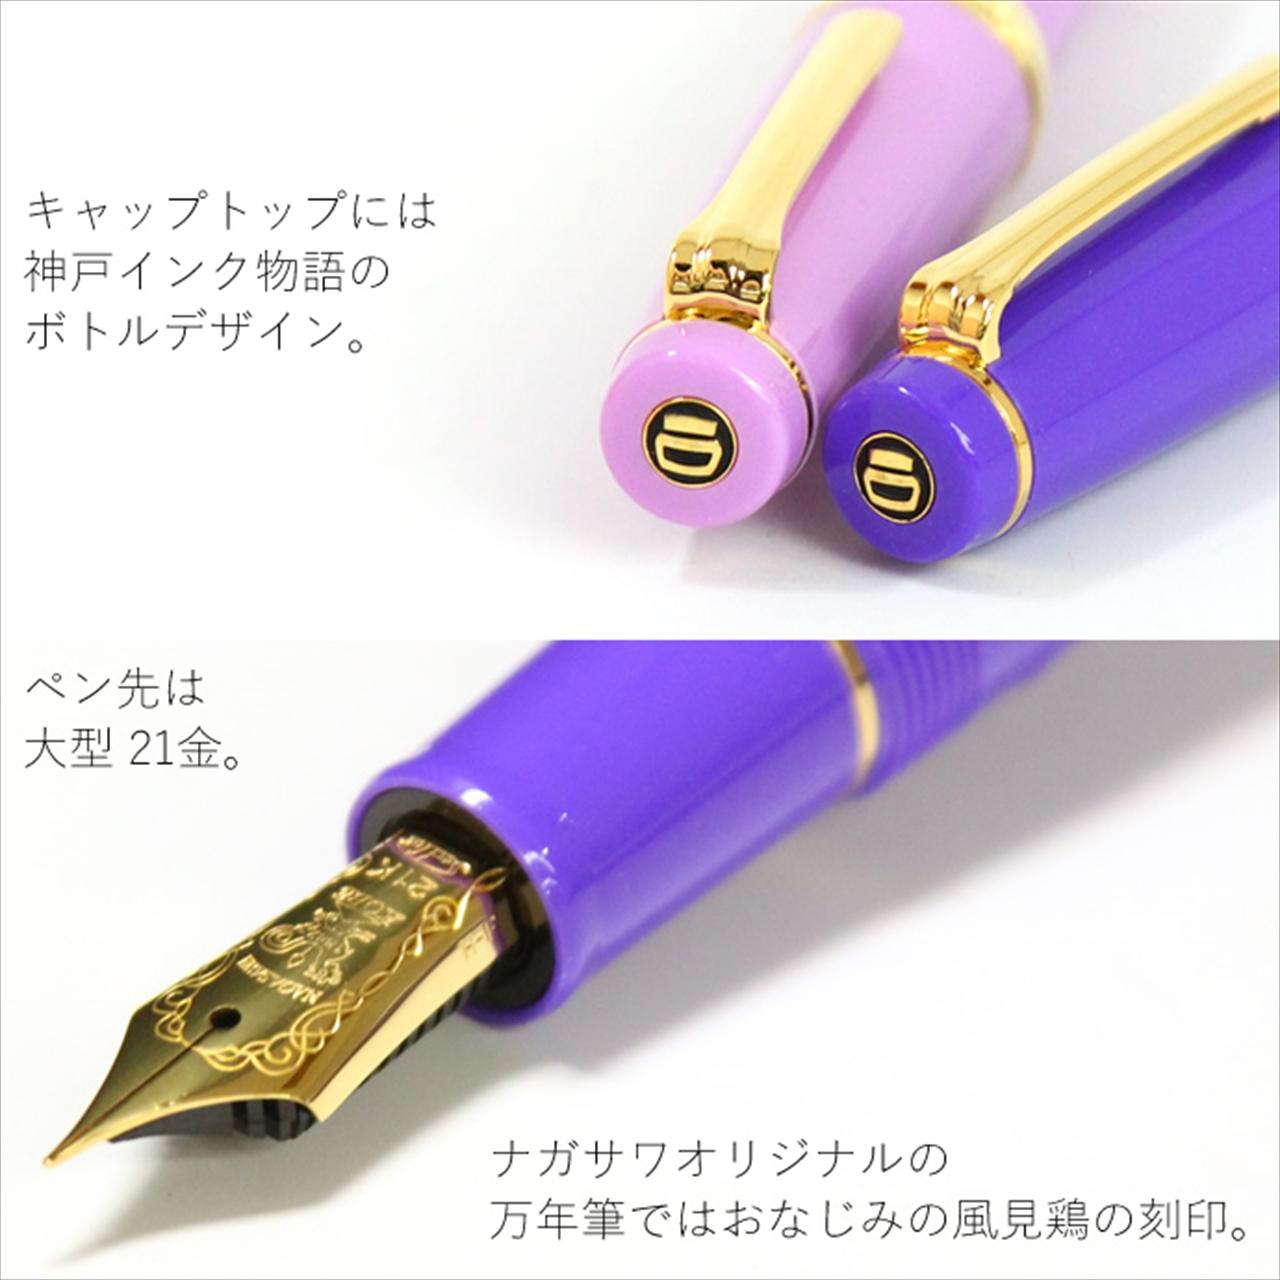 NAGASAWAオリジナル万年筆 紫陽花色 『六甲シチダンカ』『神戸ヒメアジサイ』 プロフェッショナルギアモデル